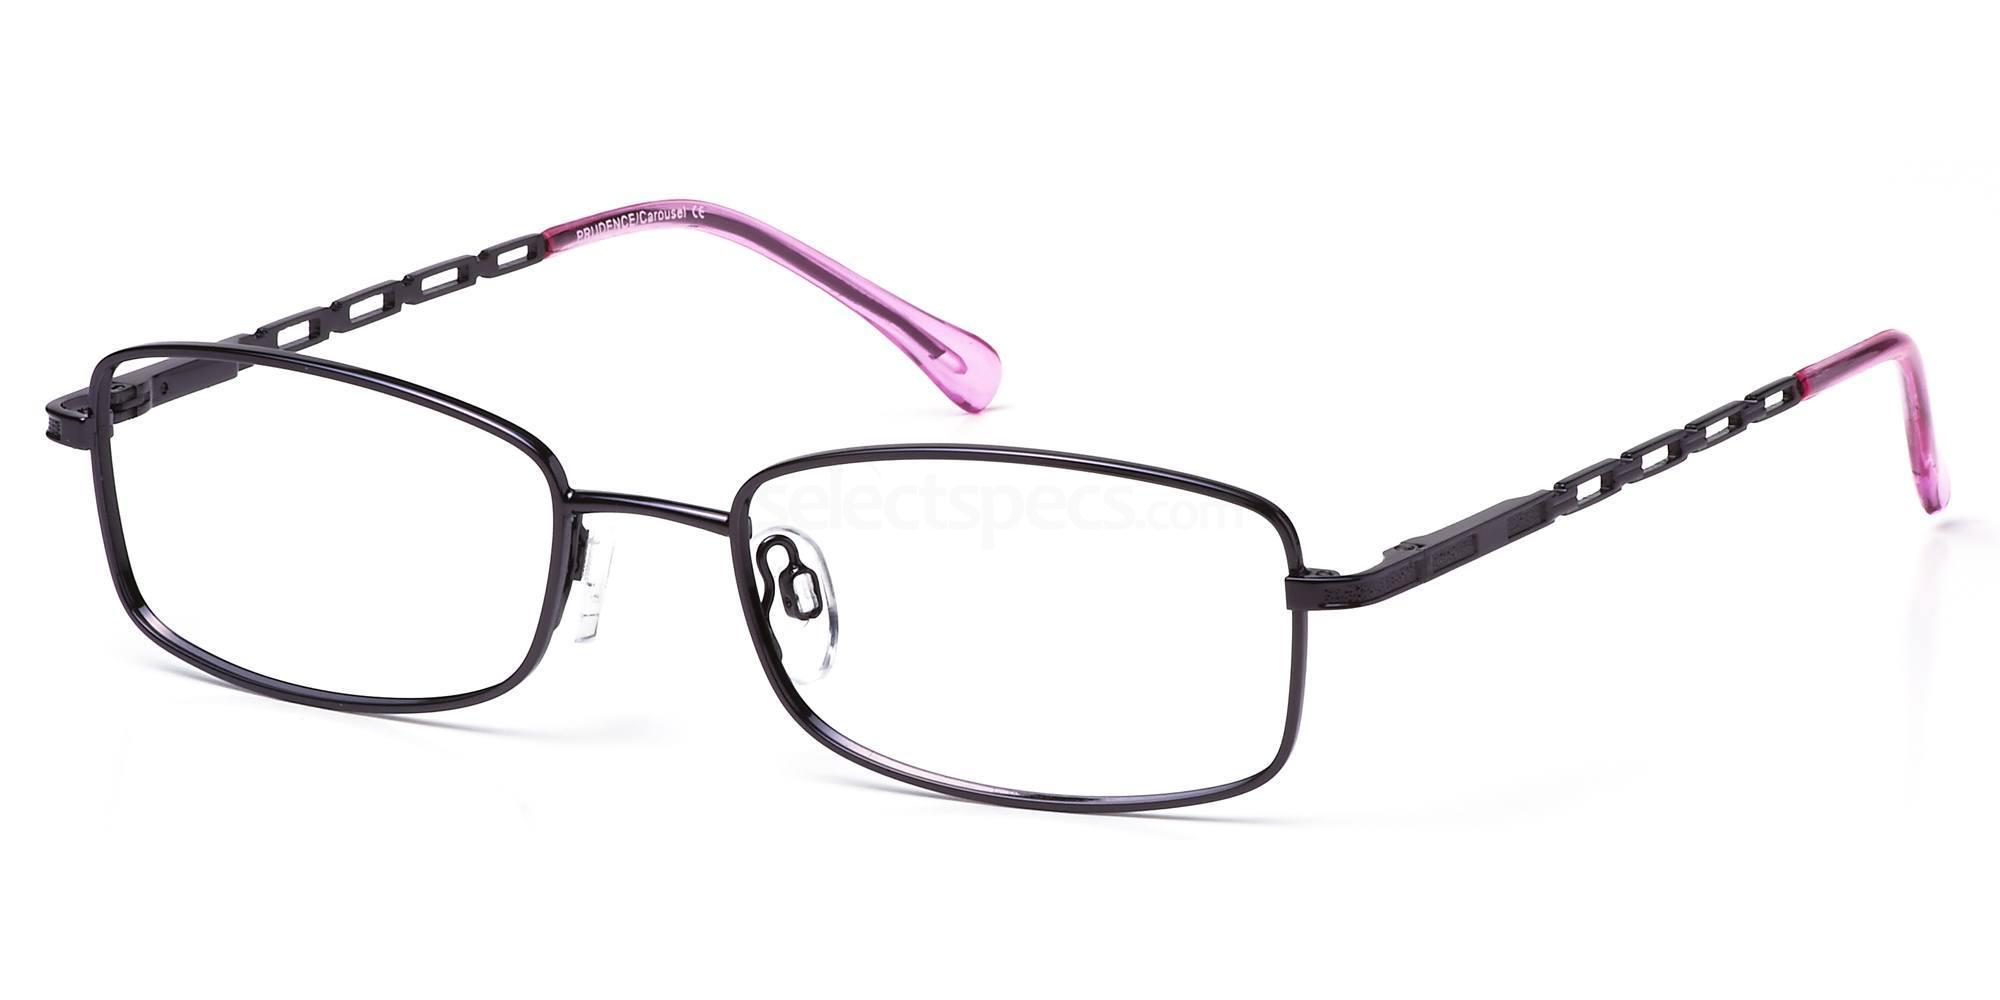 C1 PRUDENCE Glasses, Carousel